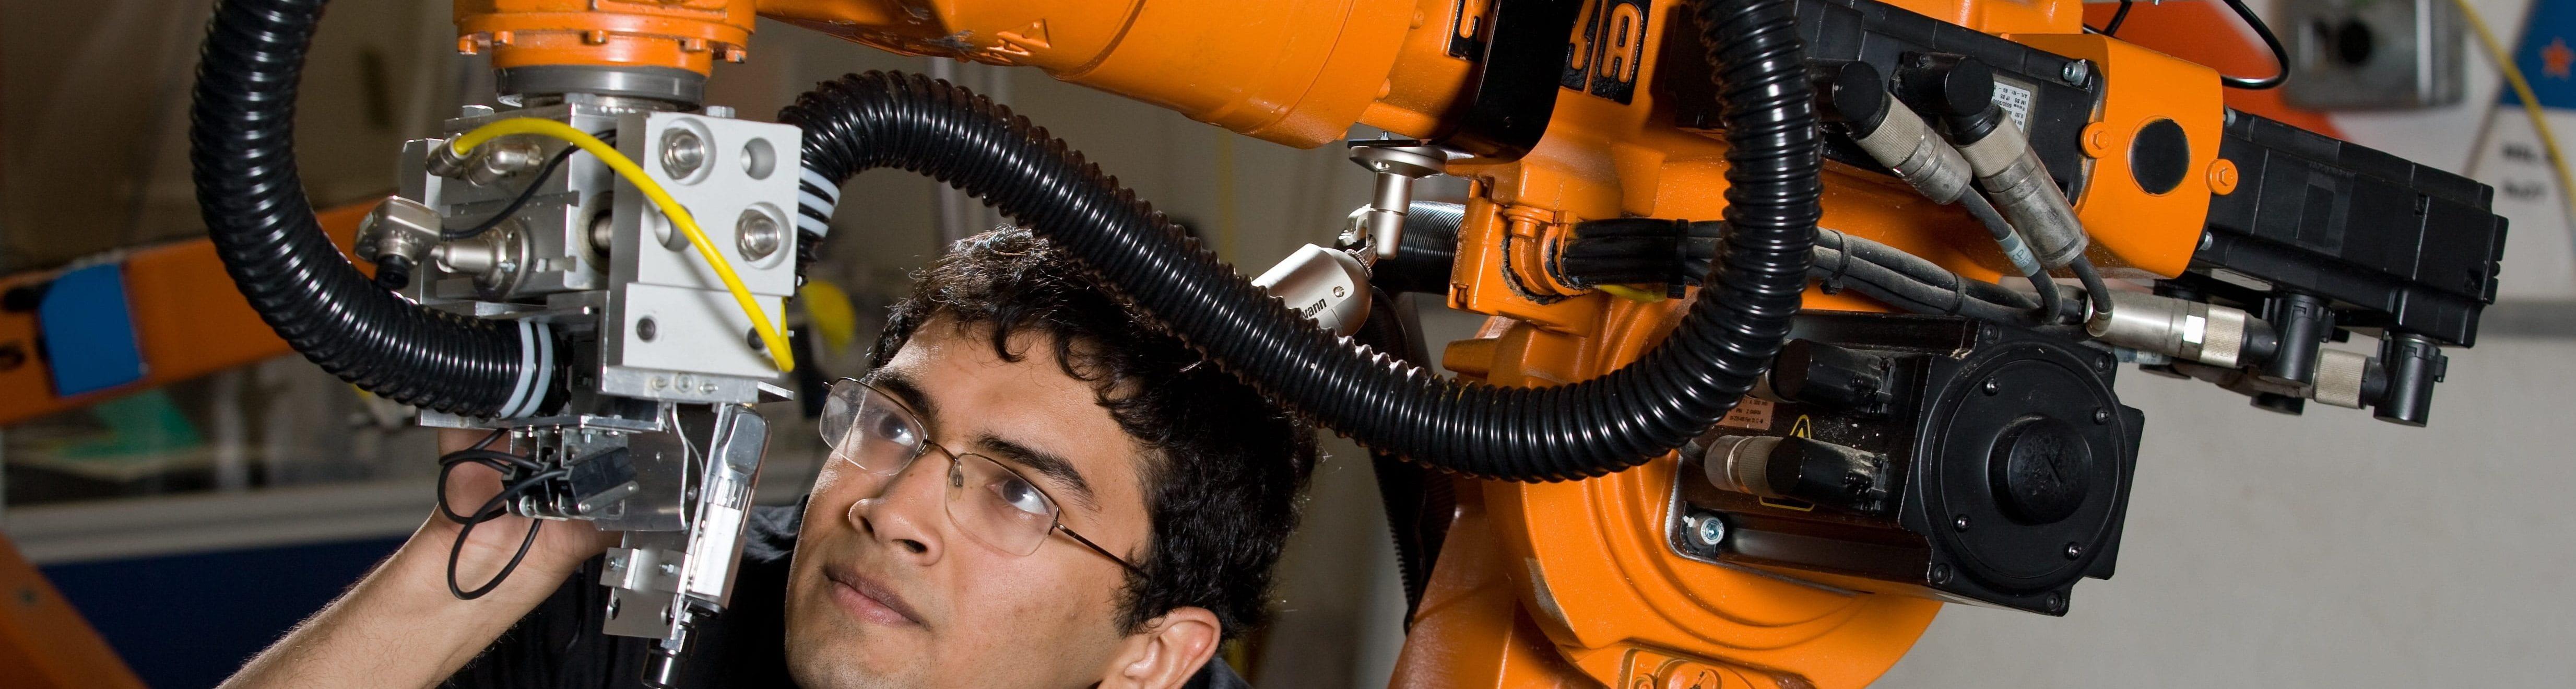 ROBOTIC DEVICE TECHNOLOGIES